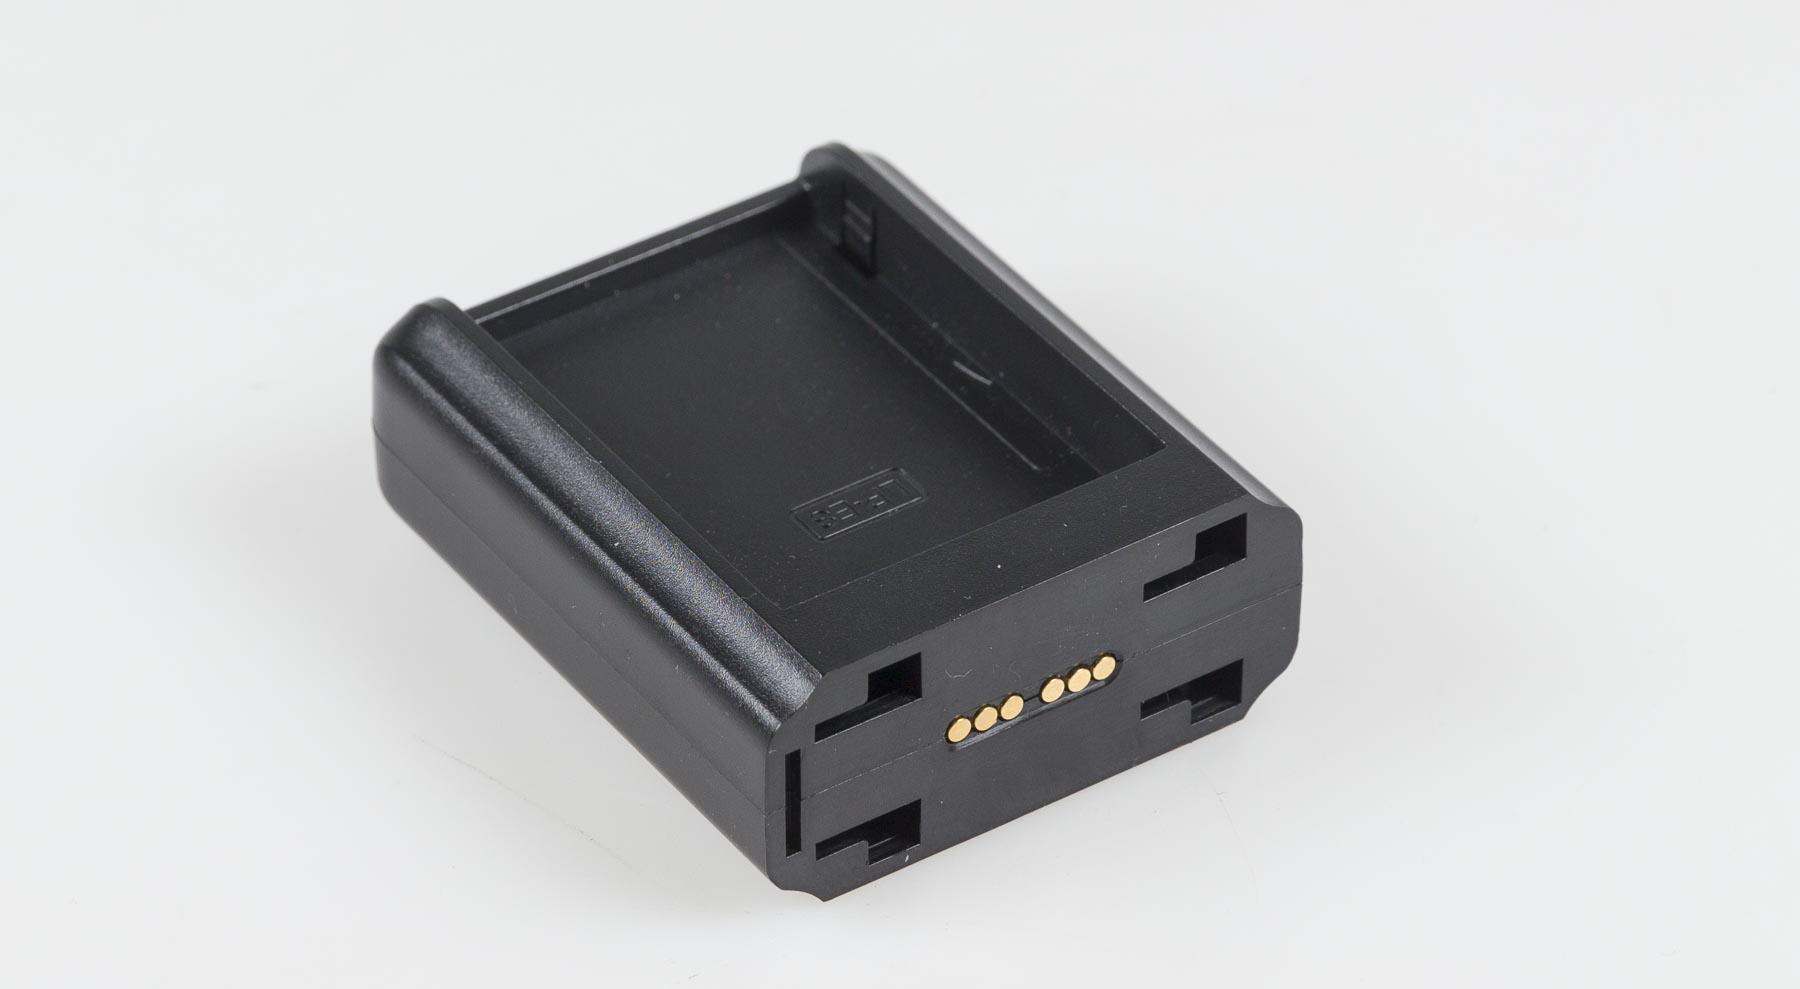 LP-E8 socket